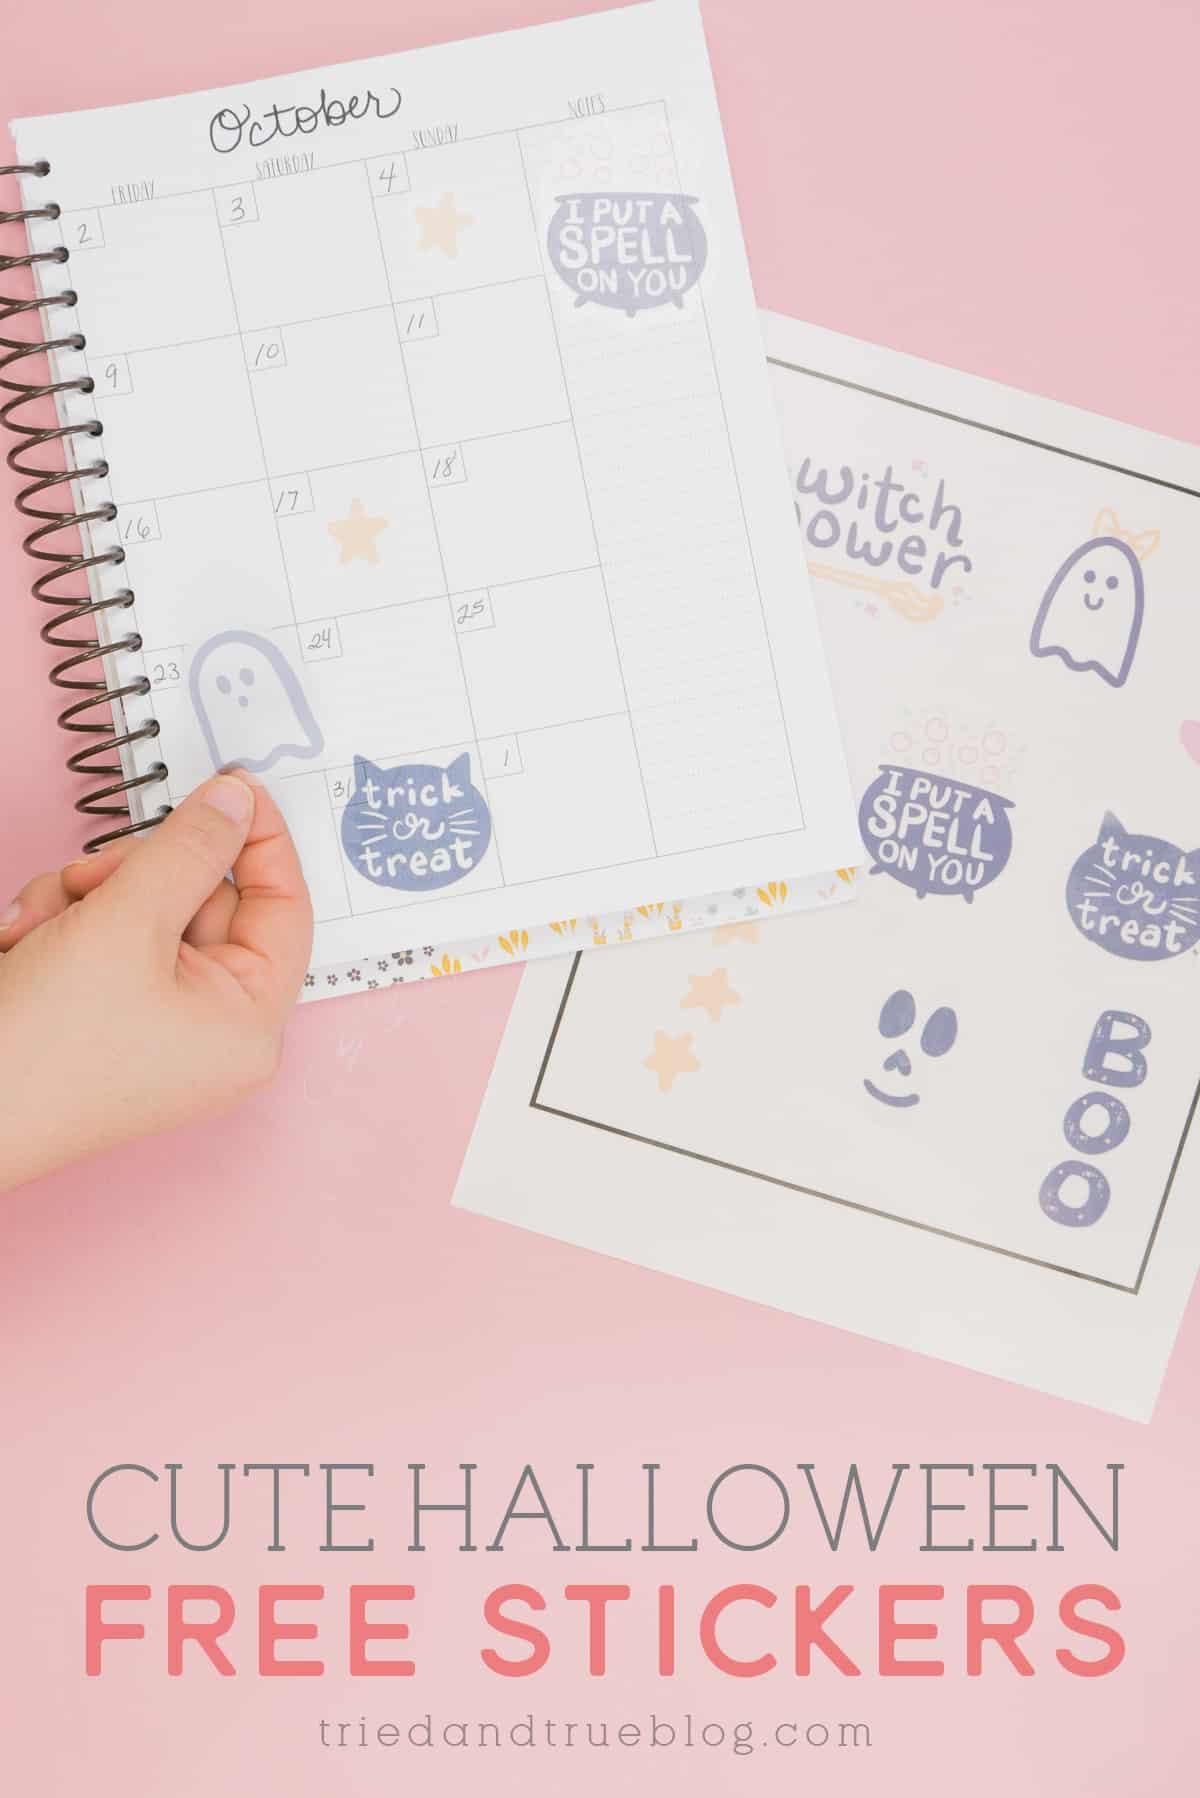 Cute Halloween Free Stickers